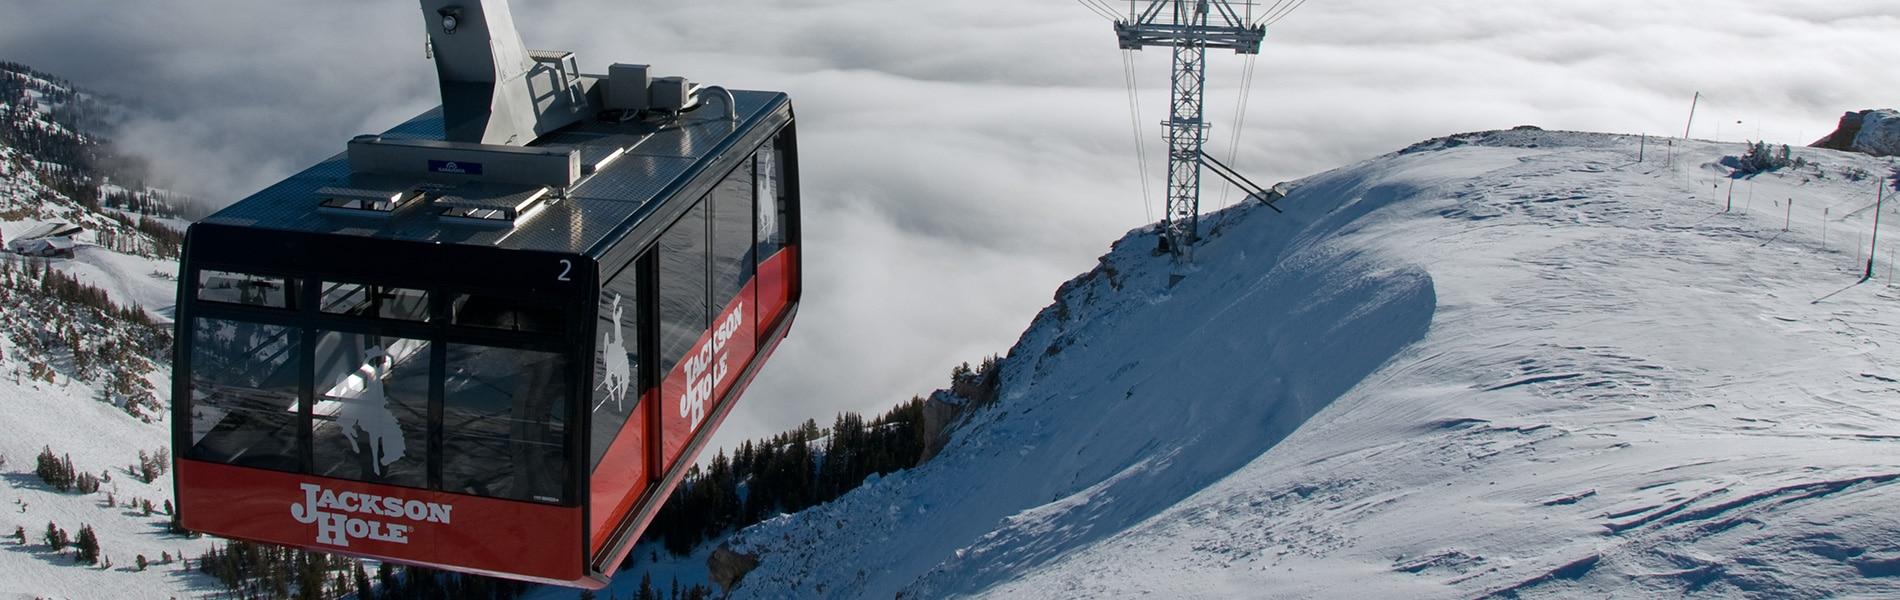 Teton Private Residence gondola in the snow.